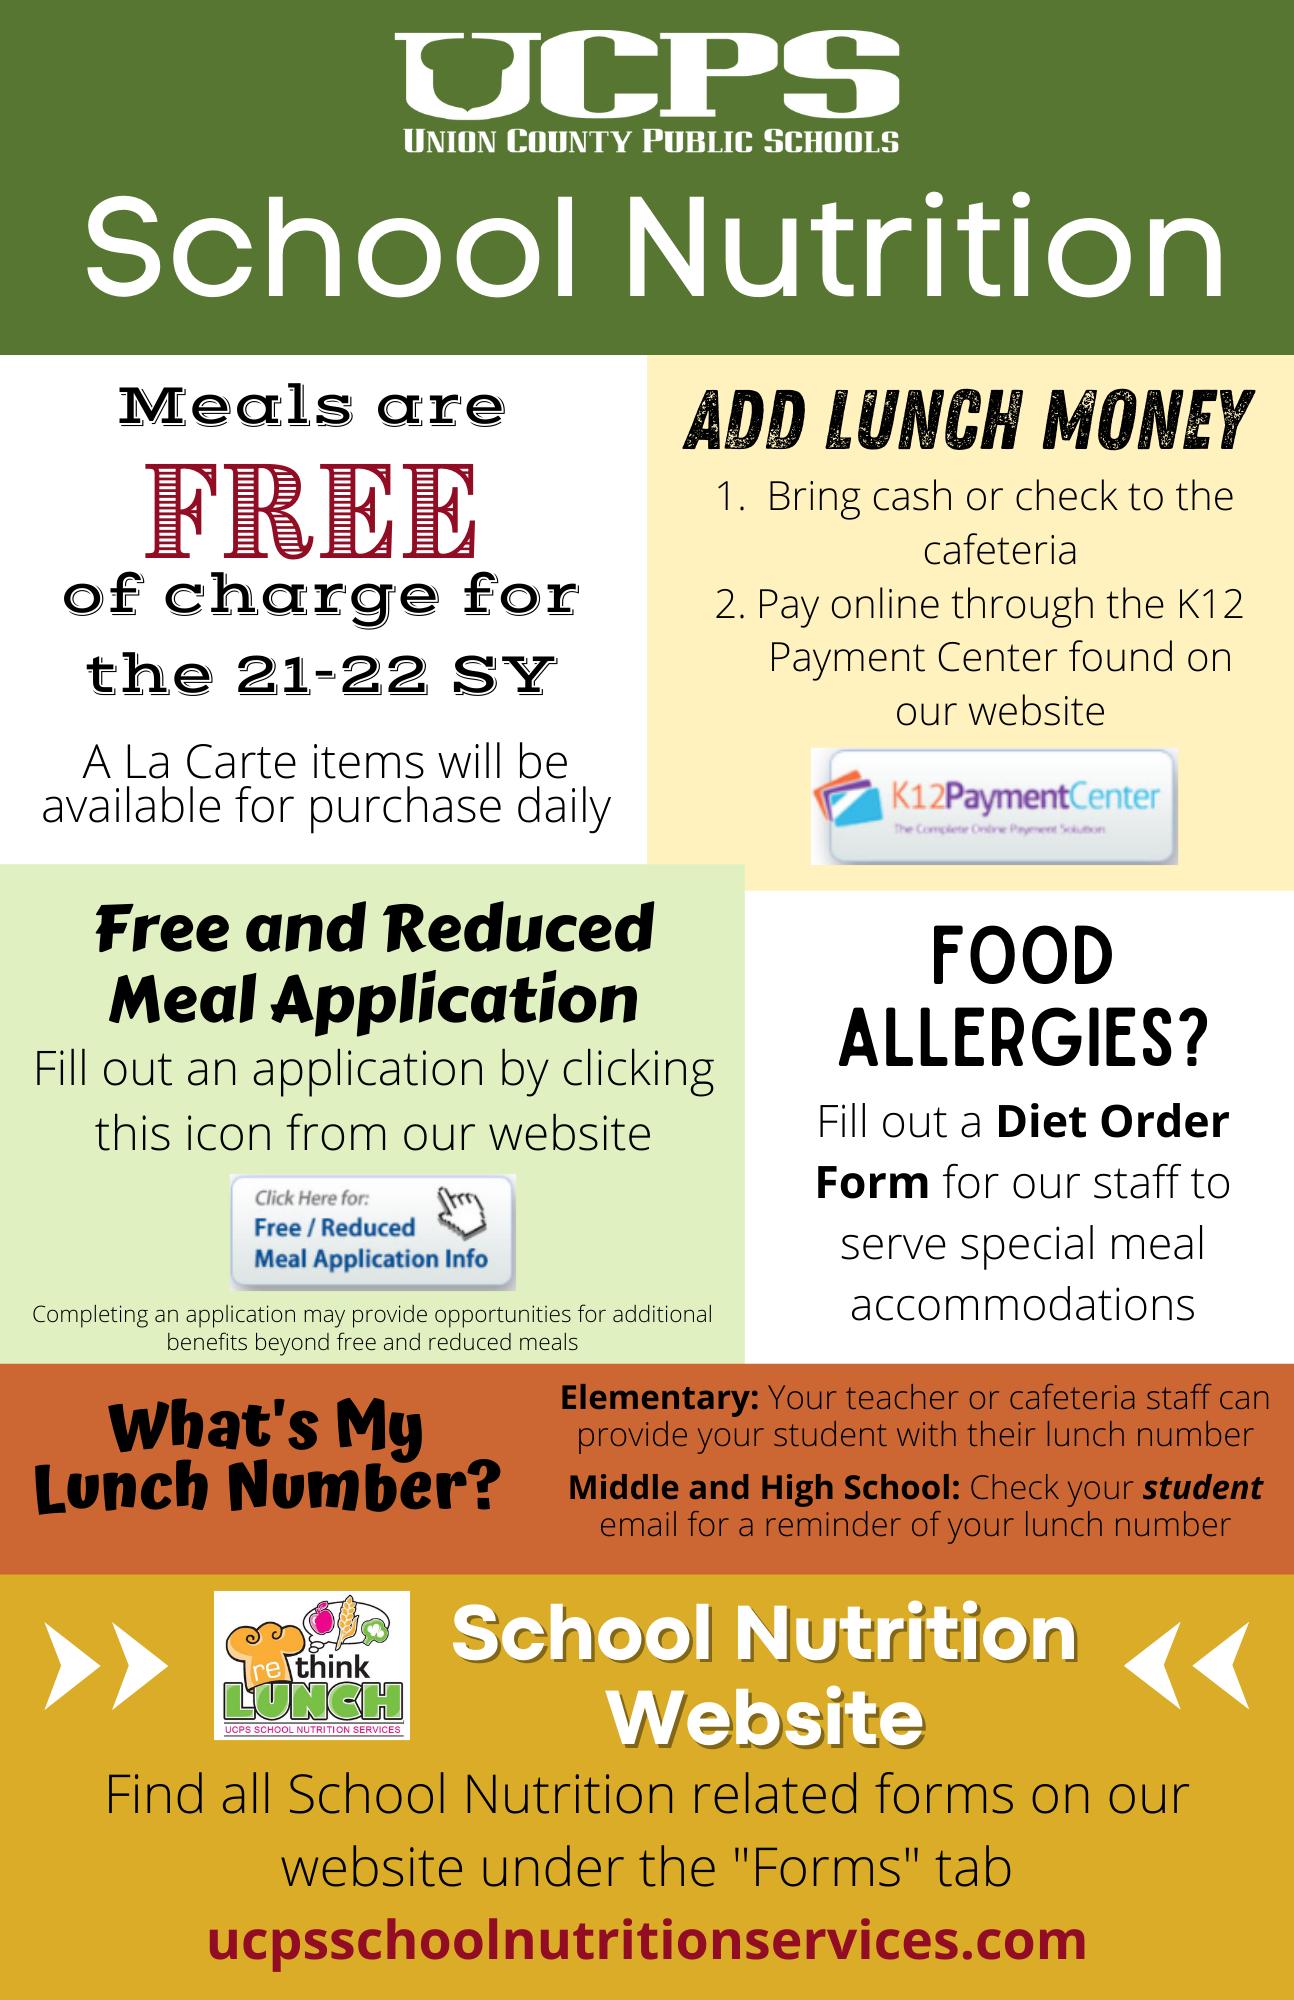 NewFolder/School Nutrition Flyer Website.png